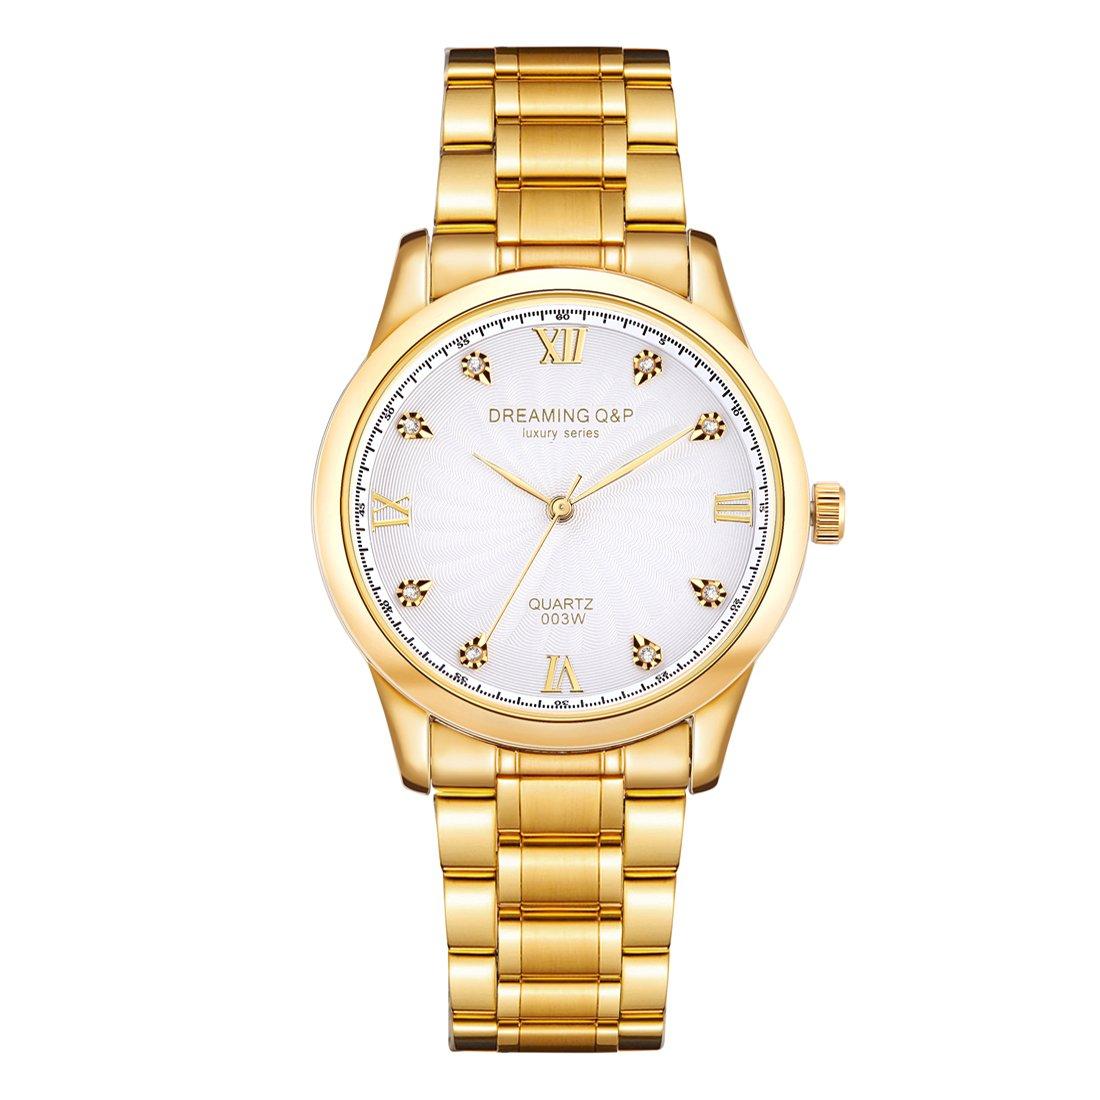 Gold Stainless Steel Men's Luxury Wrist Watch,fq003 Analog Quartz Unisex Wristwatch for Man Woman,Roman Numeral White Dail